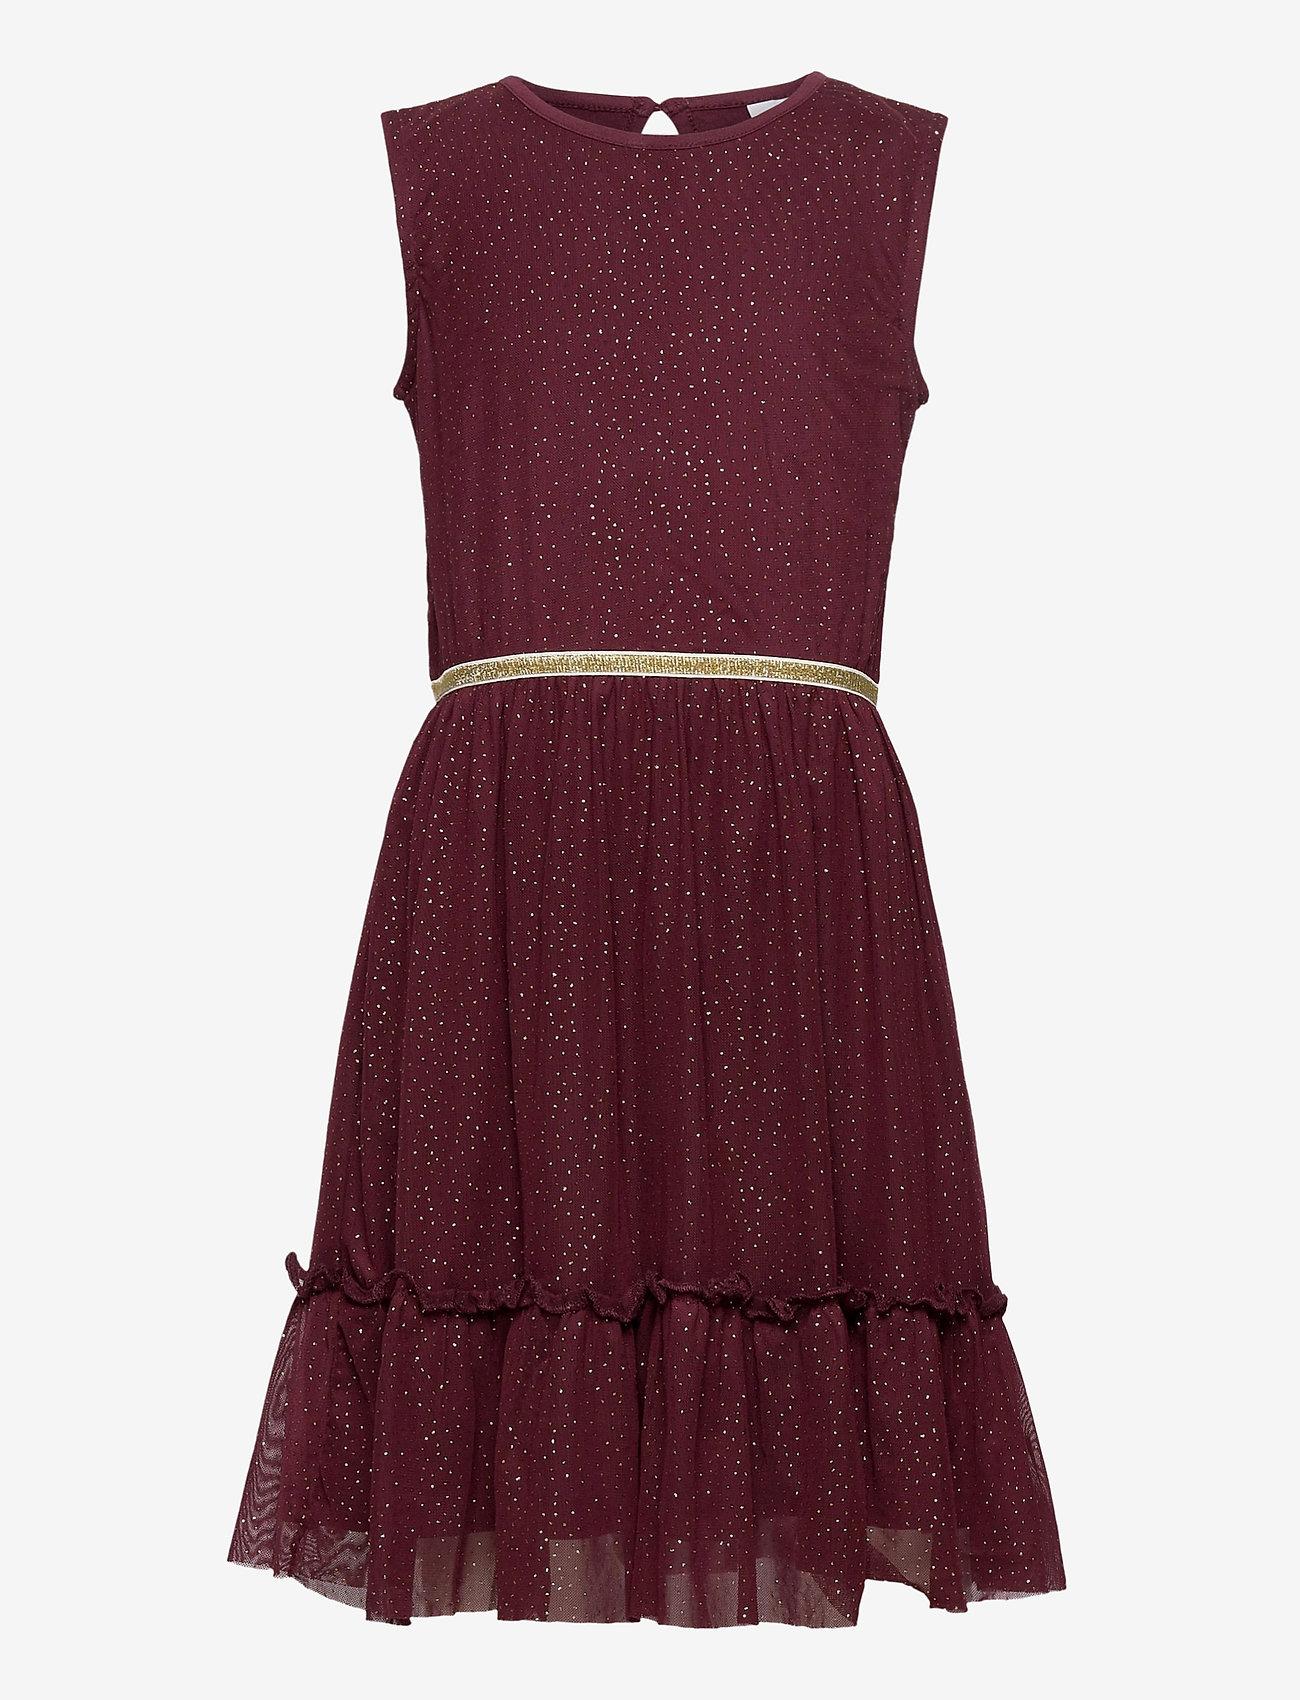 The New - ANNA RODESSA S_L DRESS - kjoler - sassafras - 0